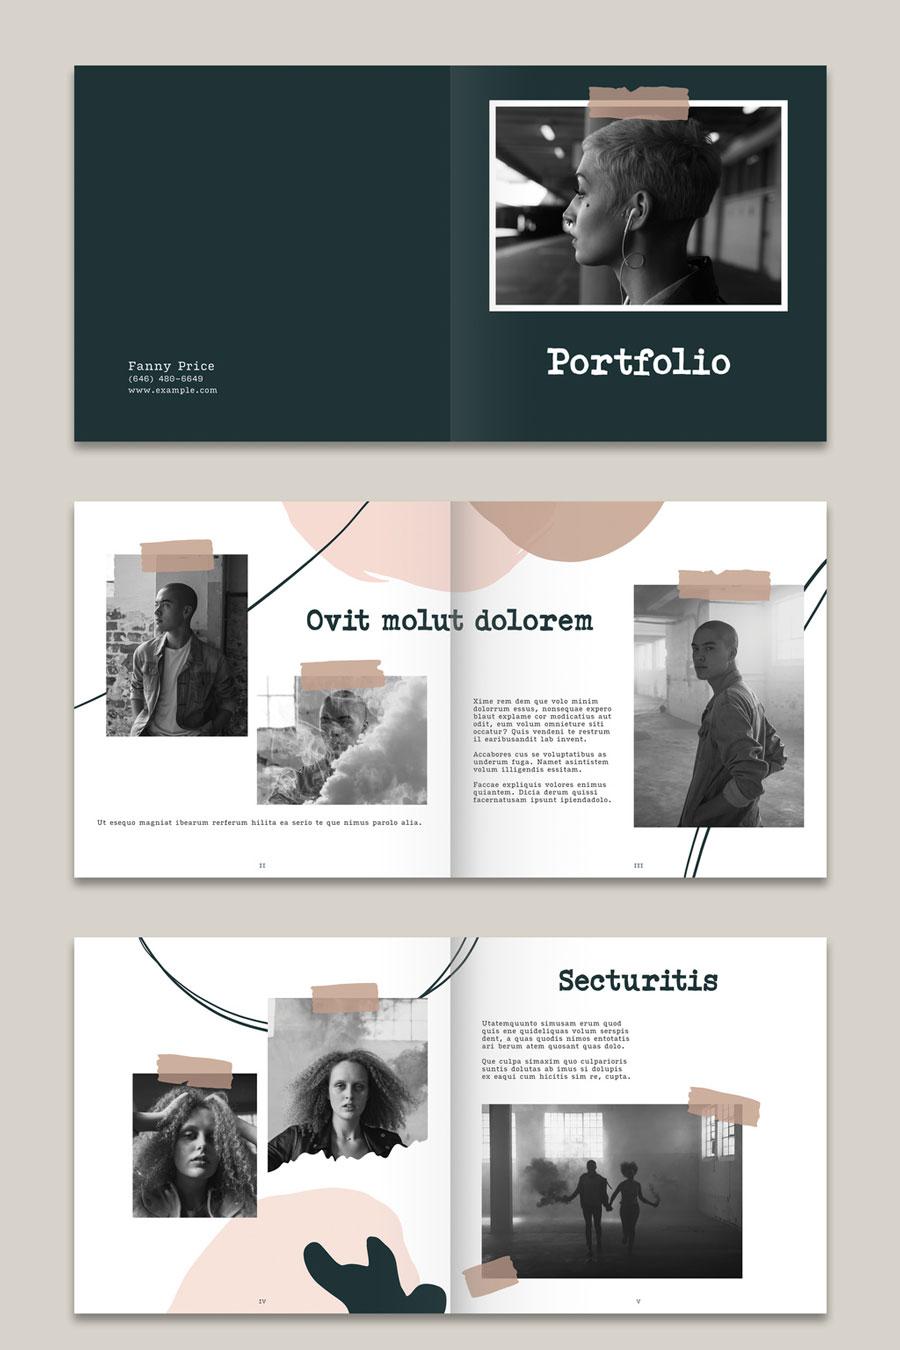 Organic Portfolio Layout